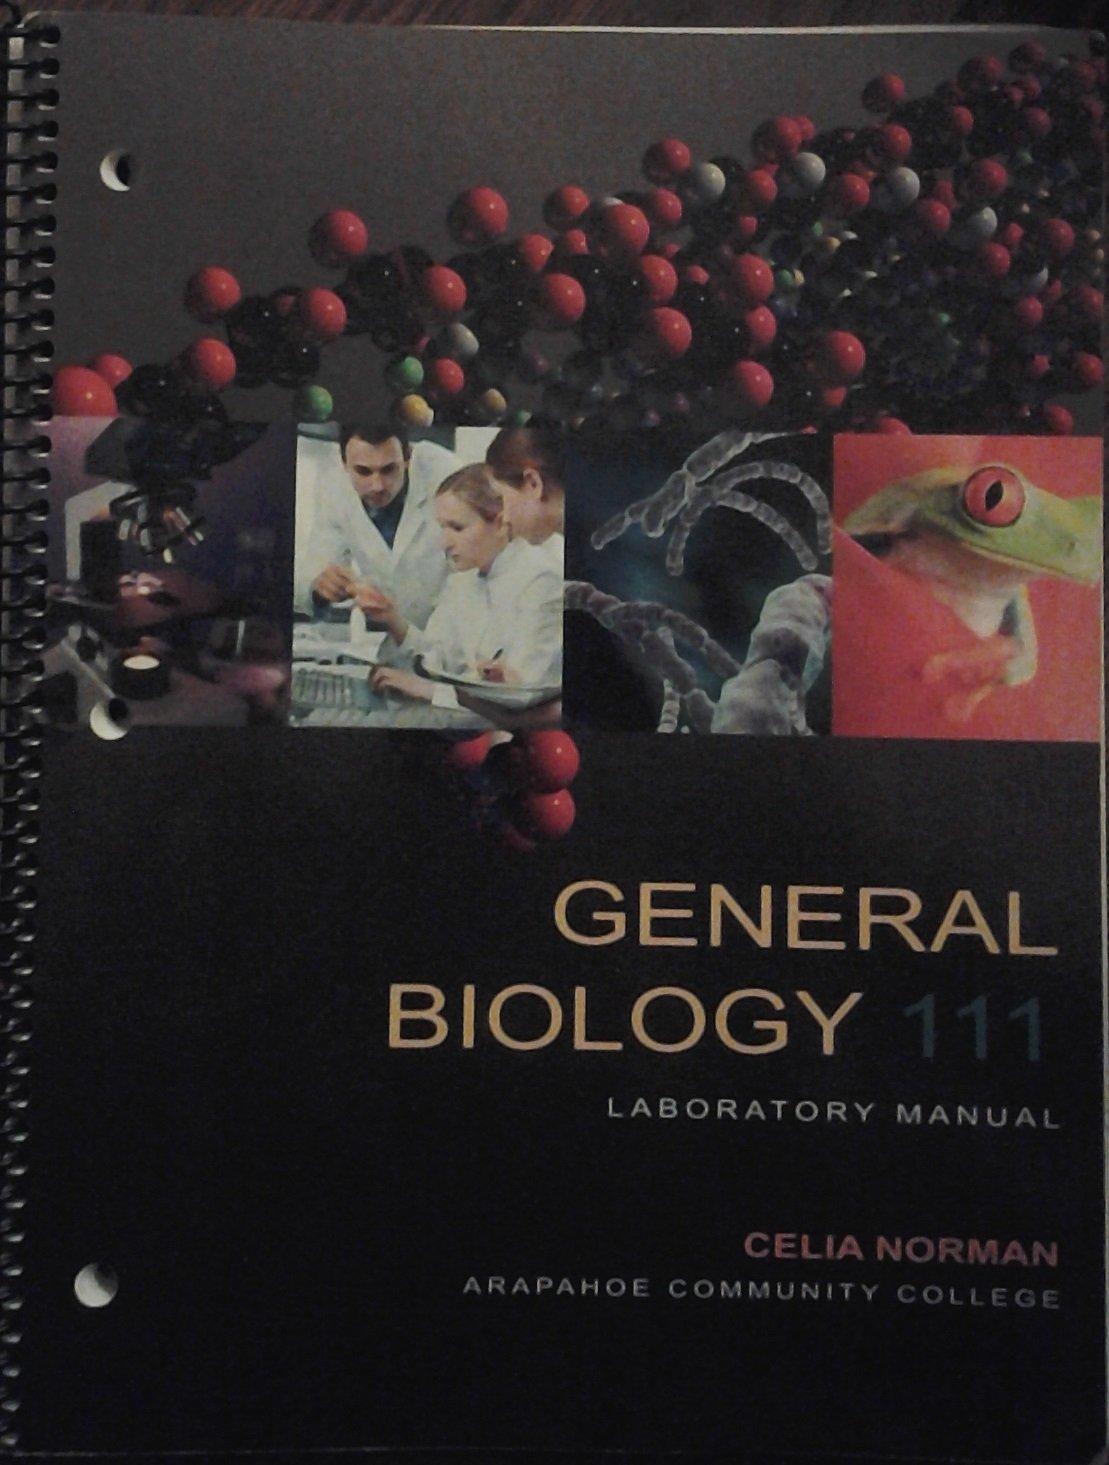 General Biology 111 Laboratory Manual: Celia Norman: 9781598714623:  Amazon.com: Books